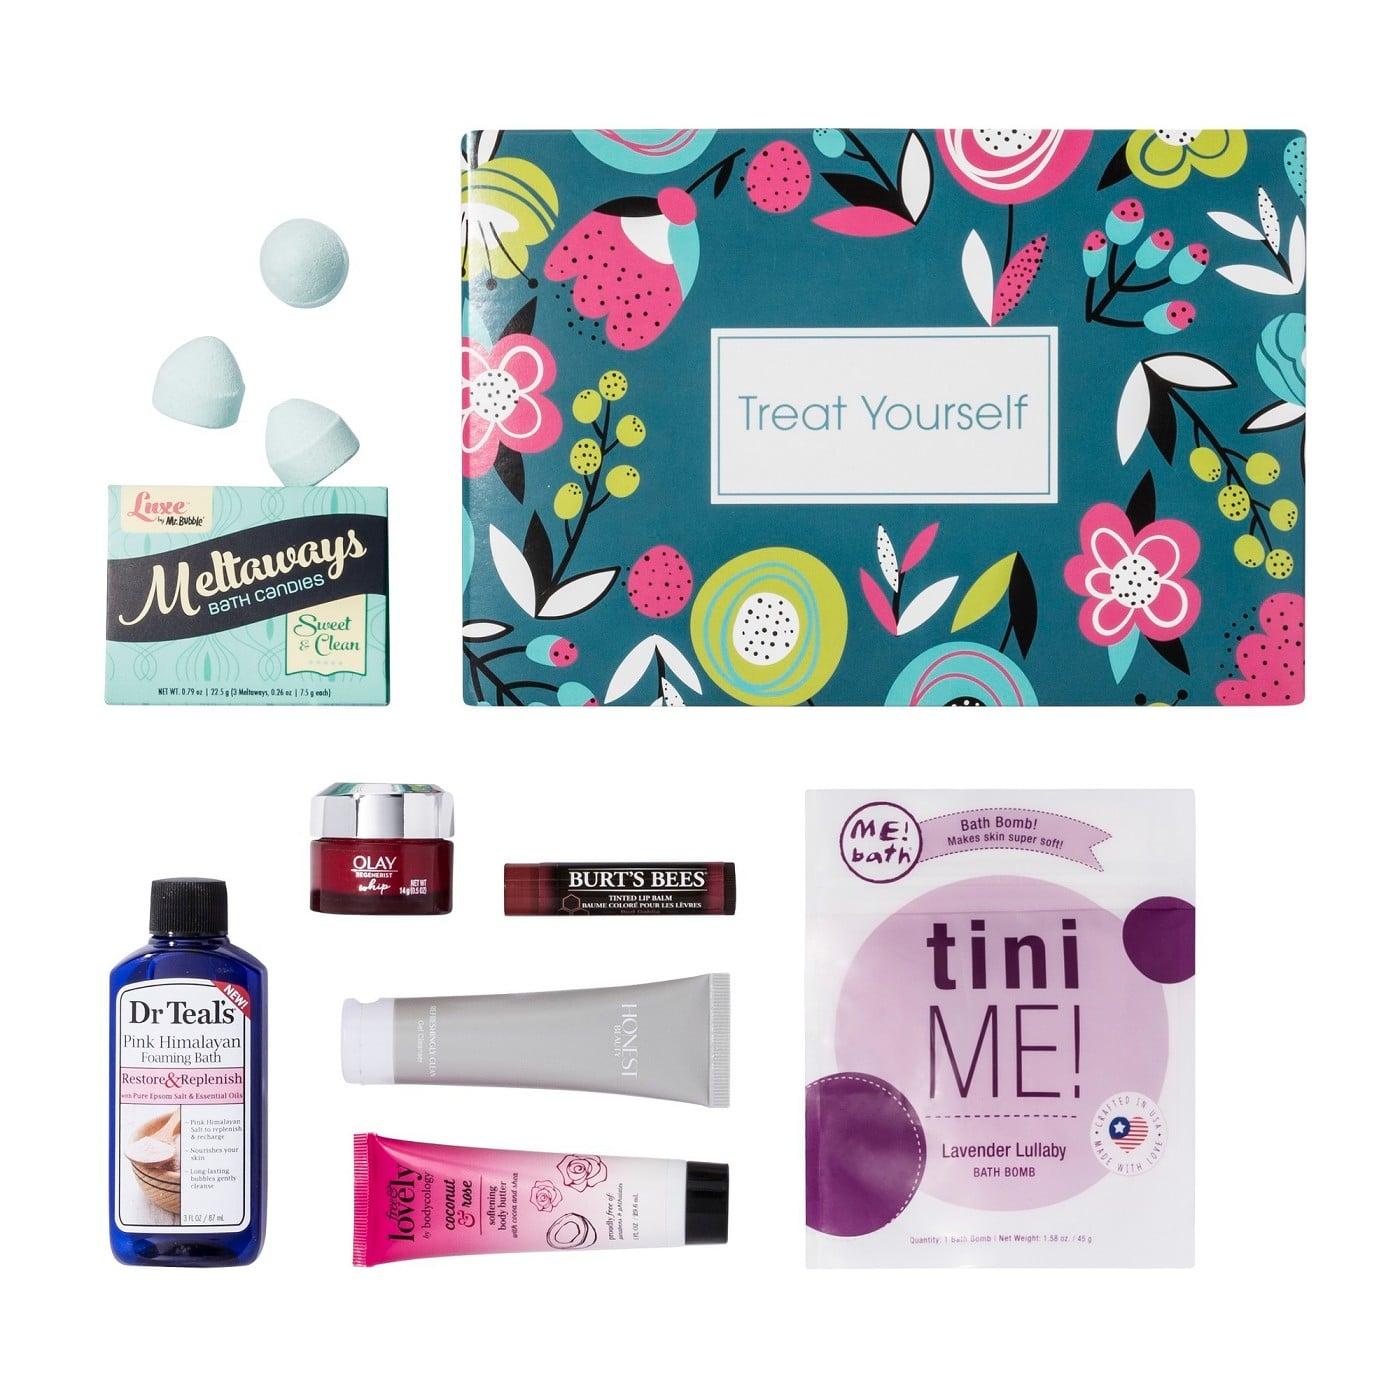 23c220c8f86 $7 Beauty Boxes at Target | POPSUGAR Beauty